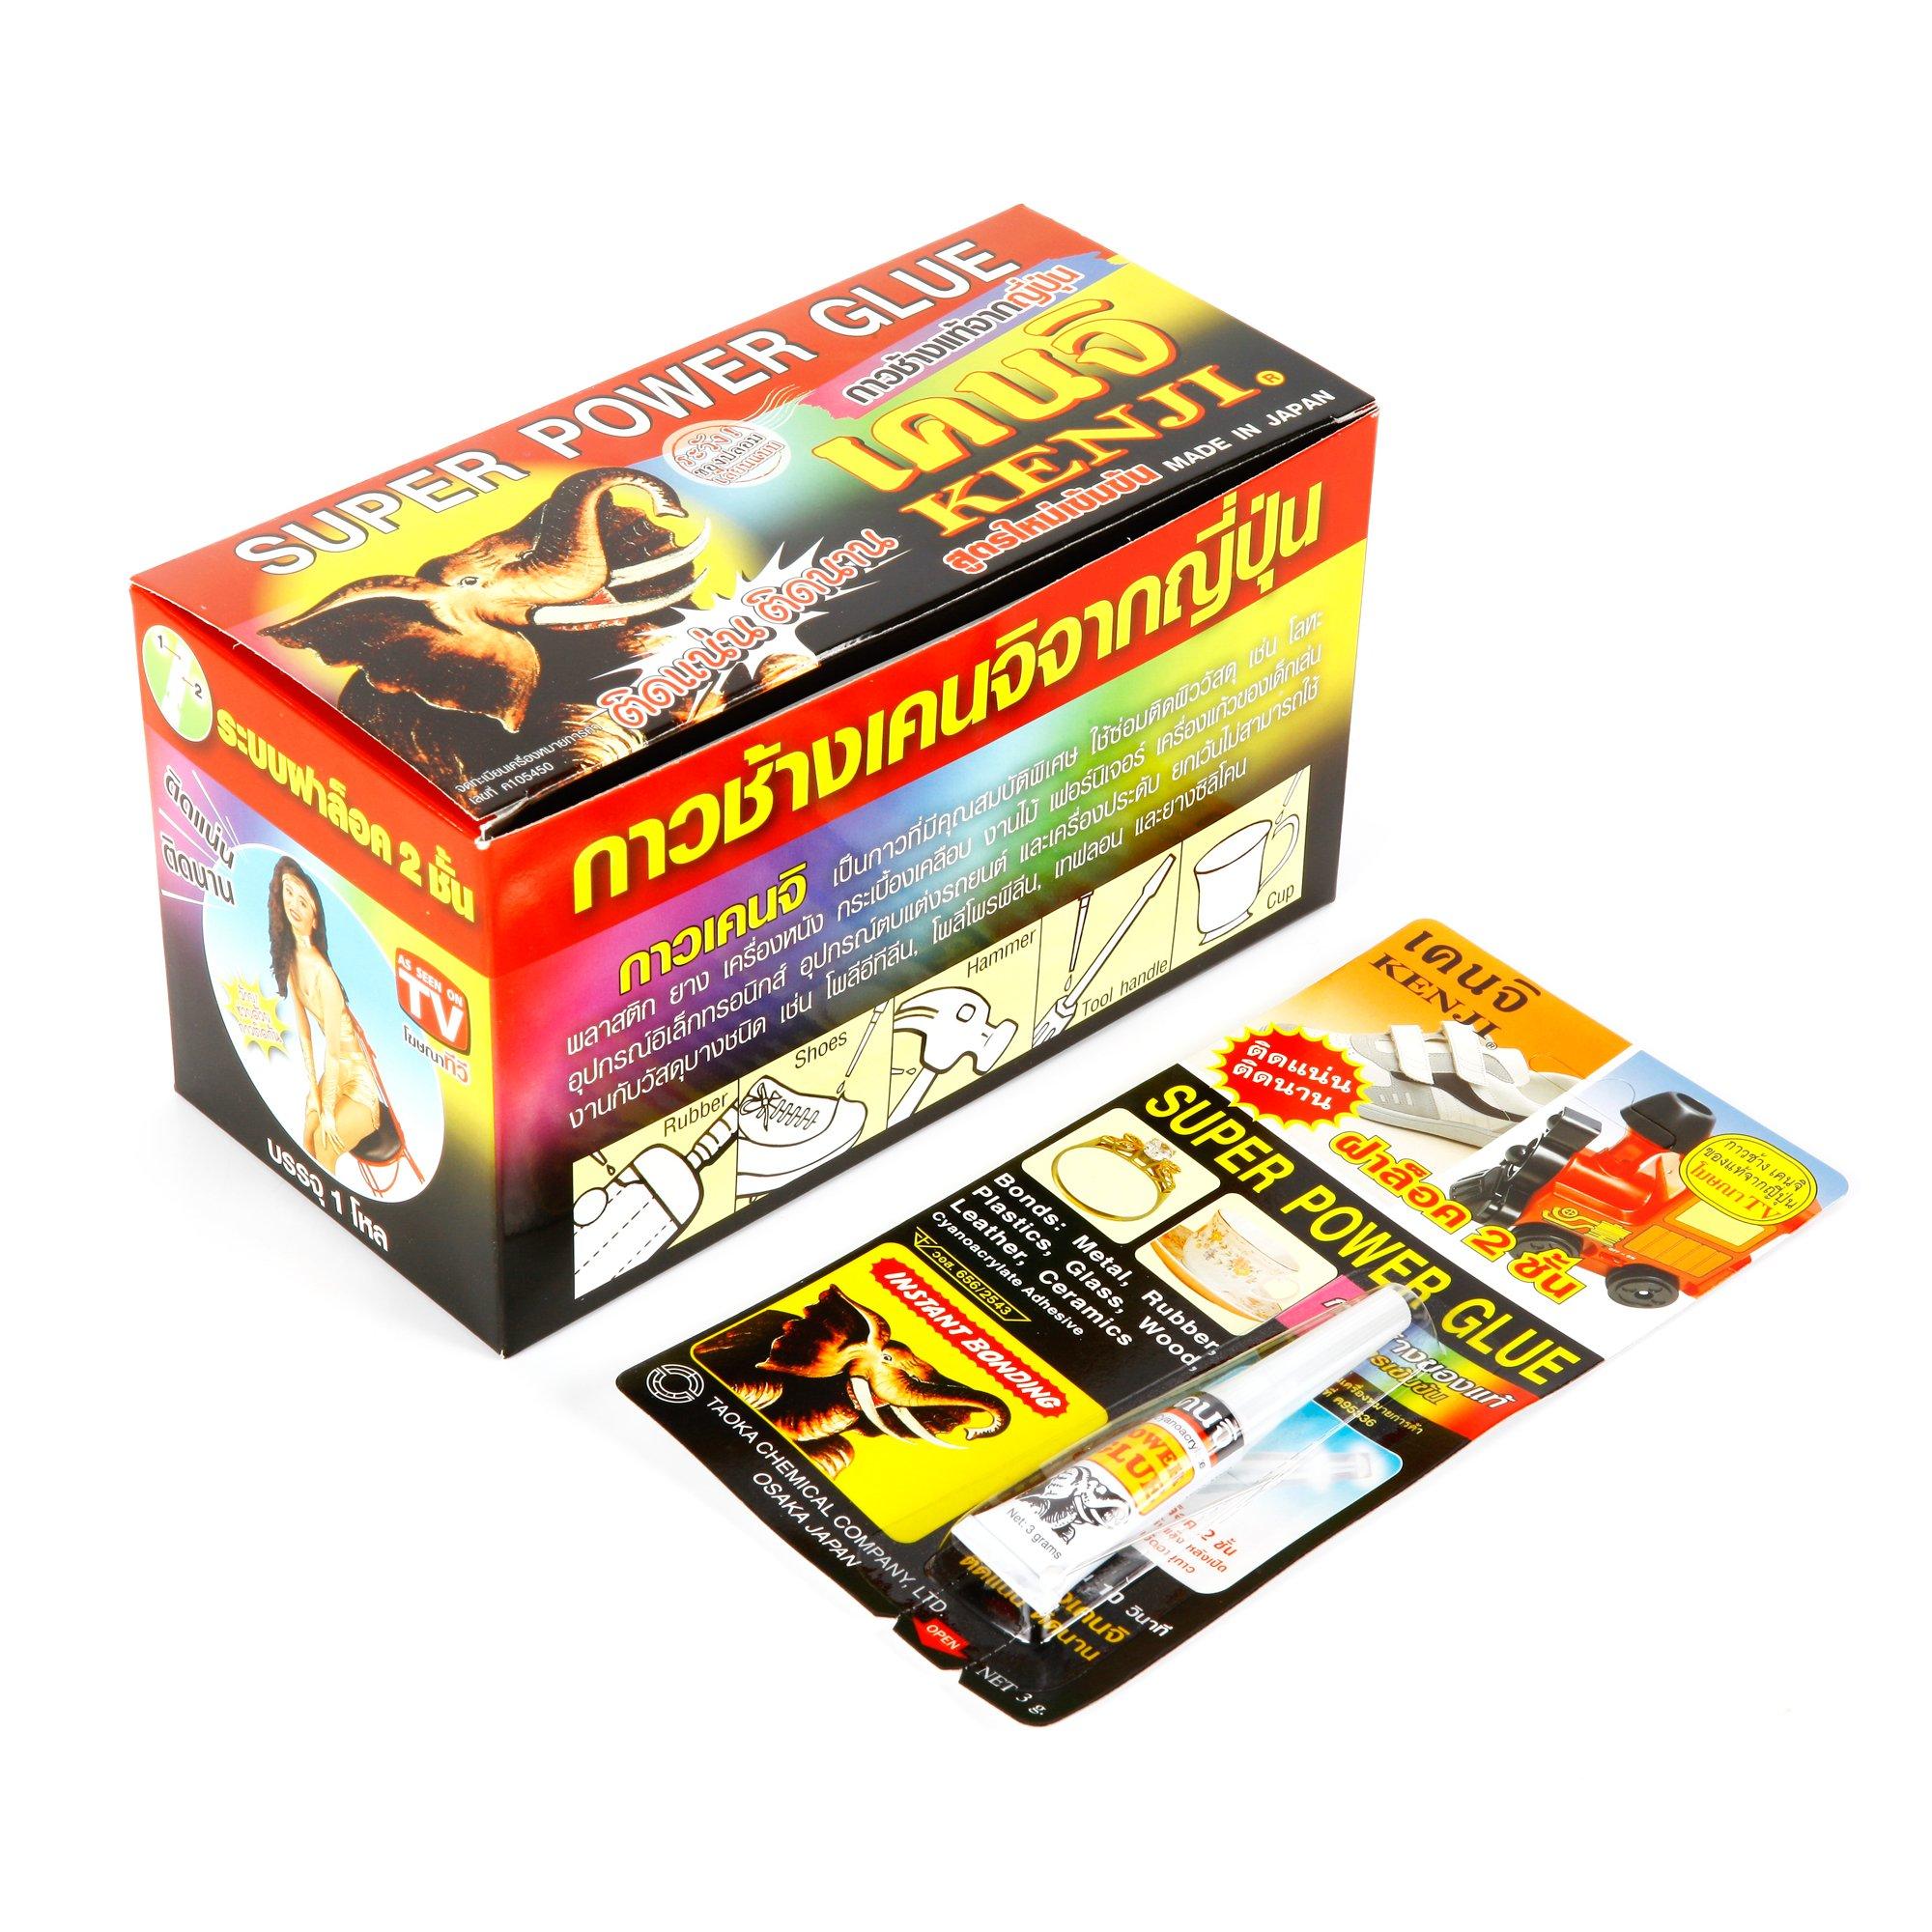 Kenji Super Power Glue 3g, Pack 12 pcs.